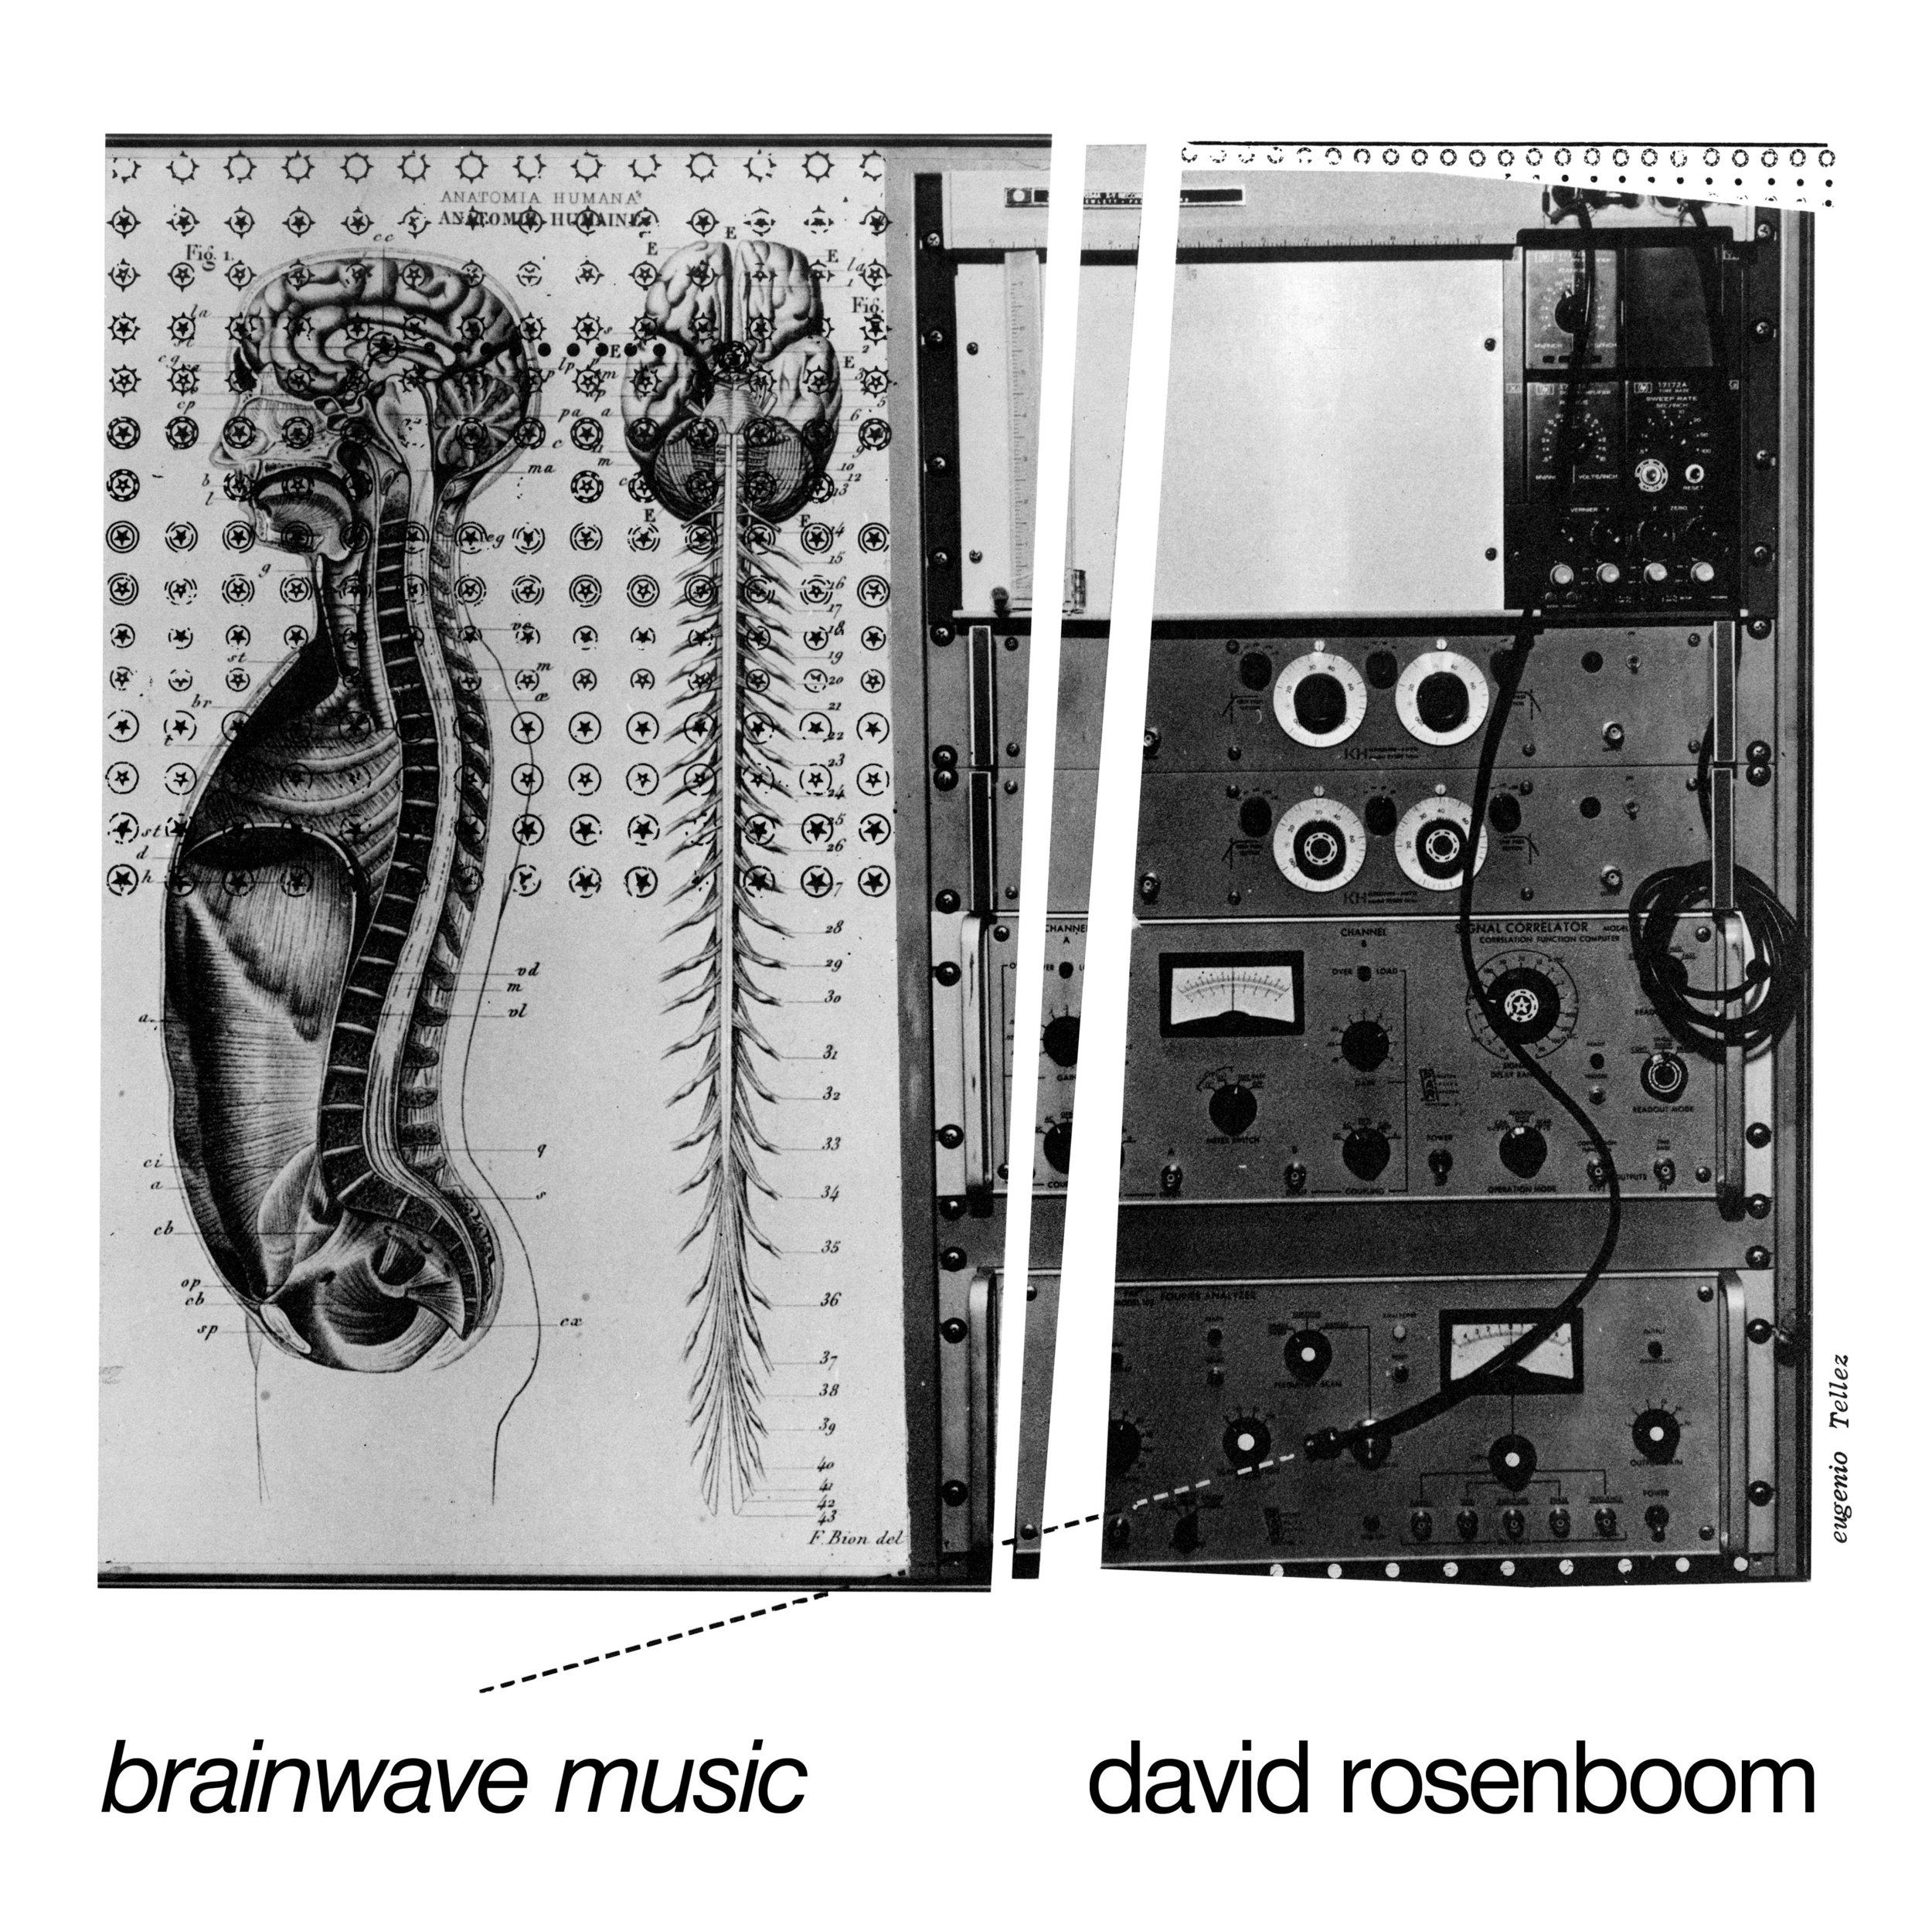 brainwave.jpg